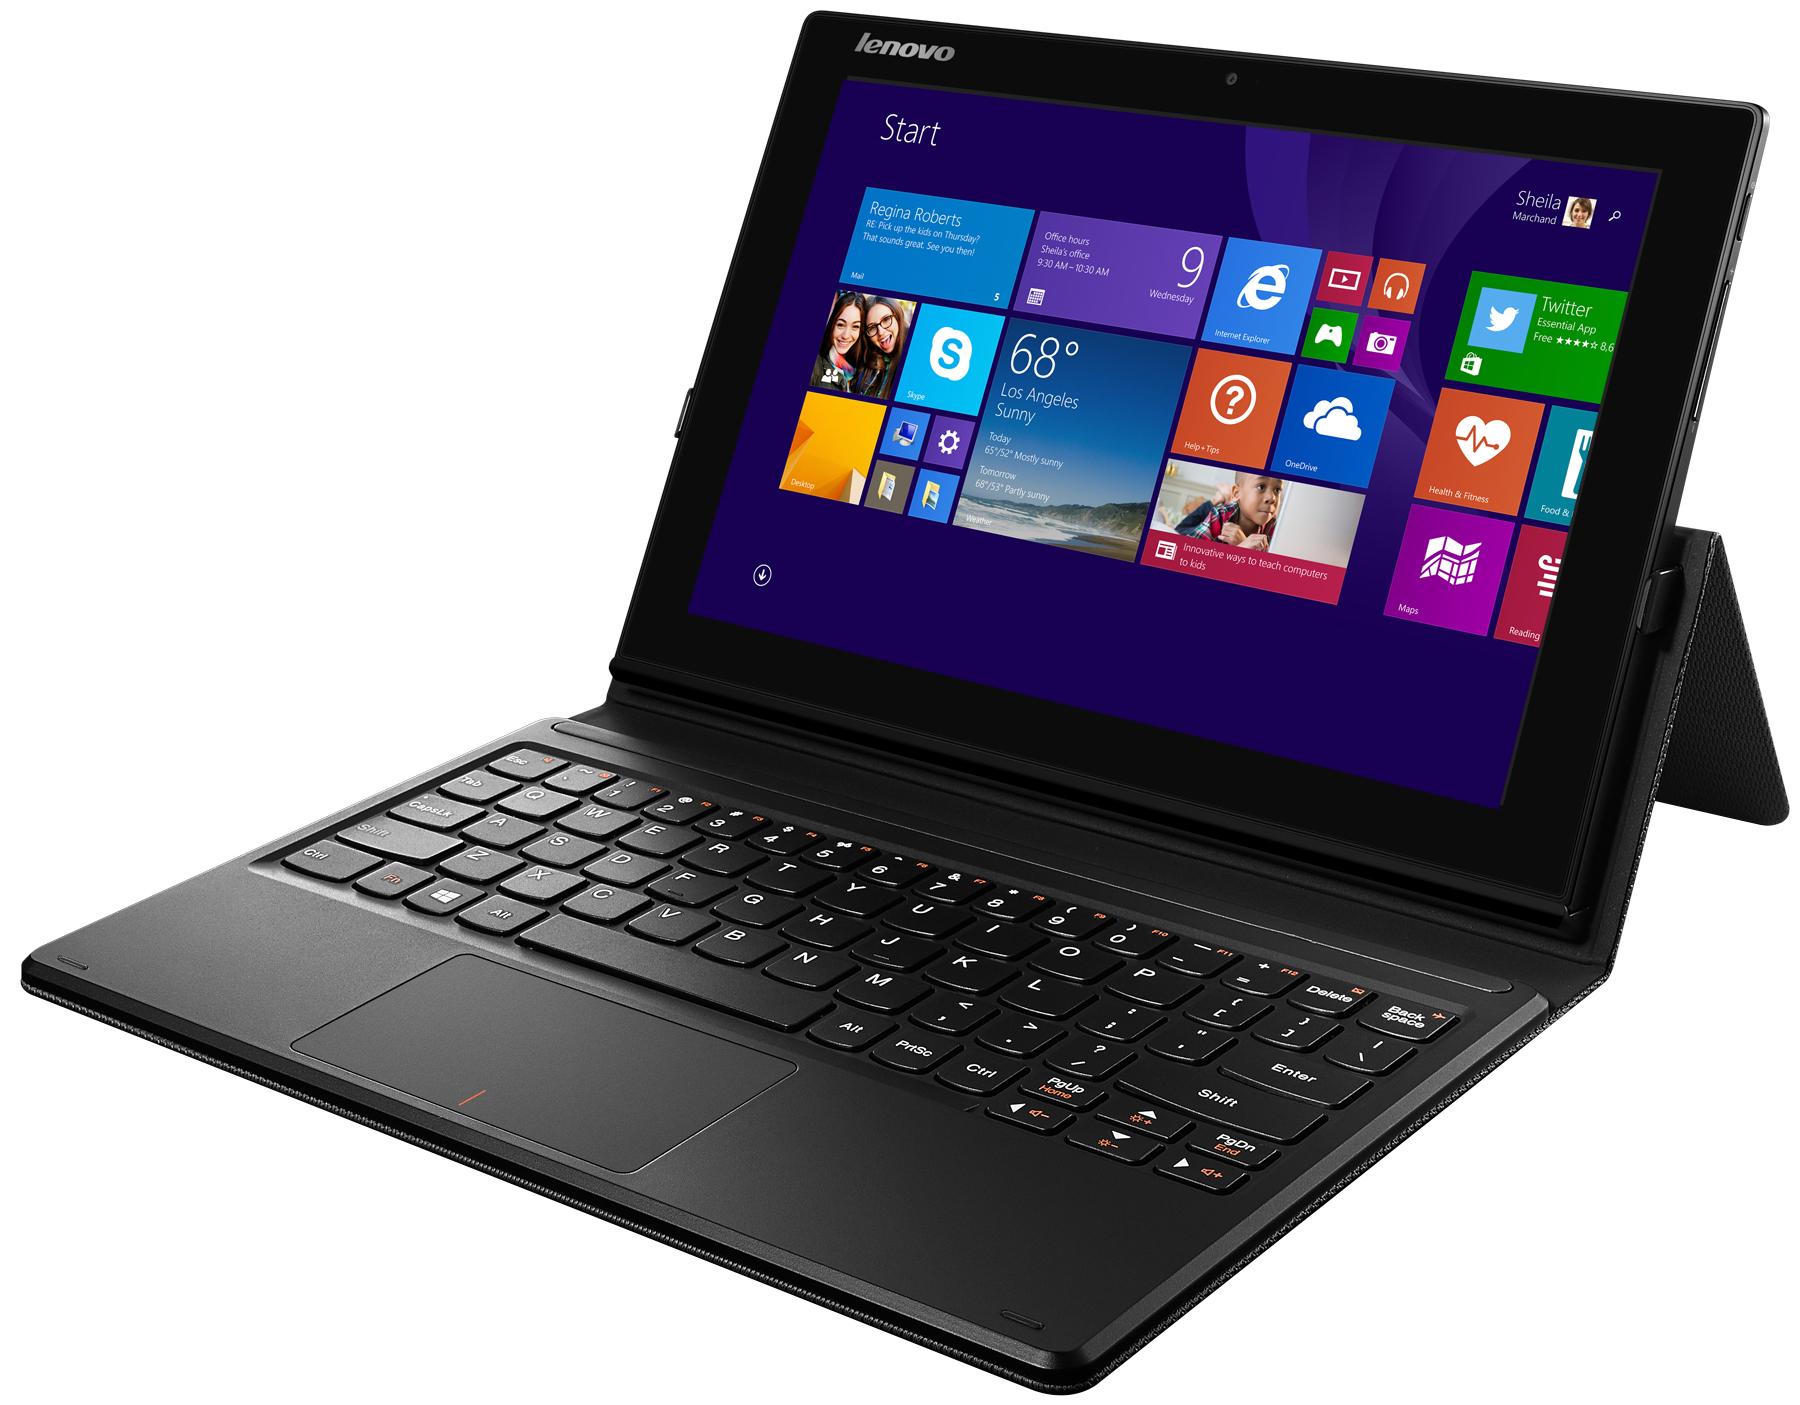 Servis Tableta Lenovo Novi Sad Realnet A3500 16gb Midnight Blue Miix3 10 64gb